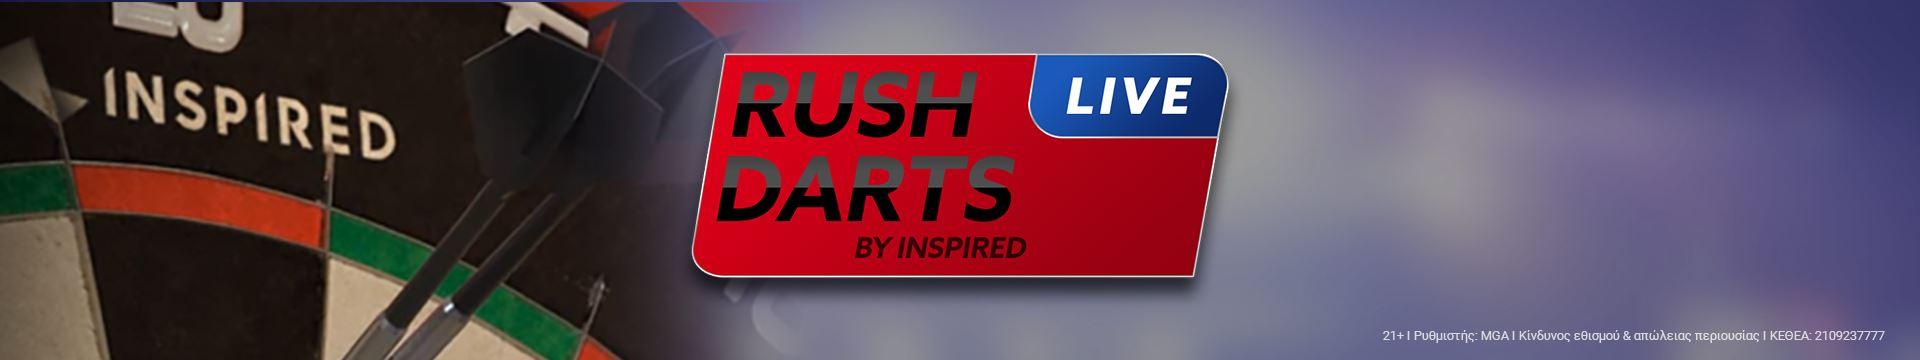 Rush_Darts